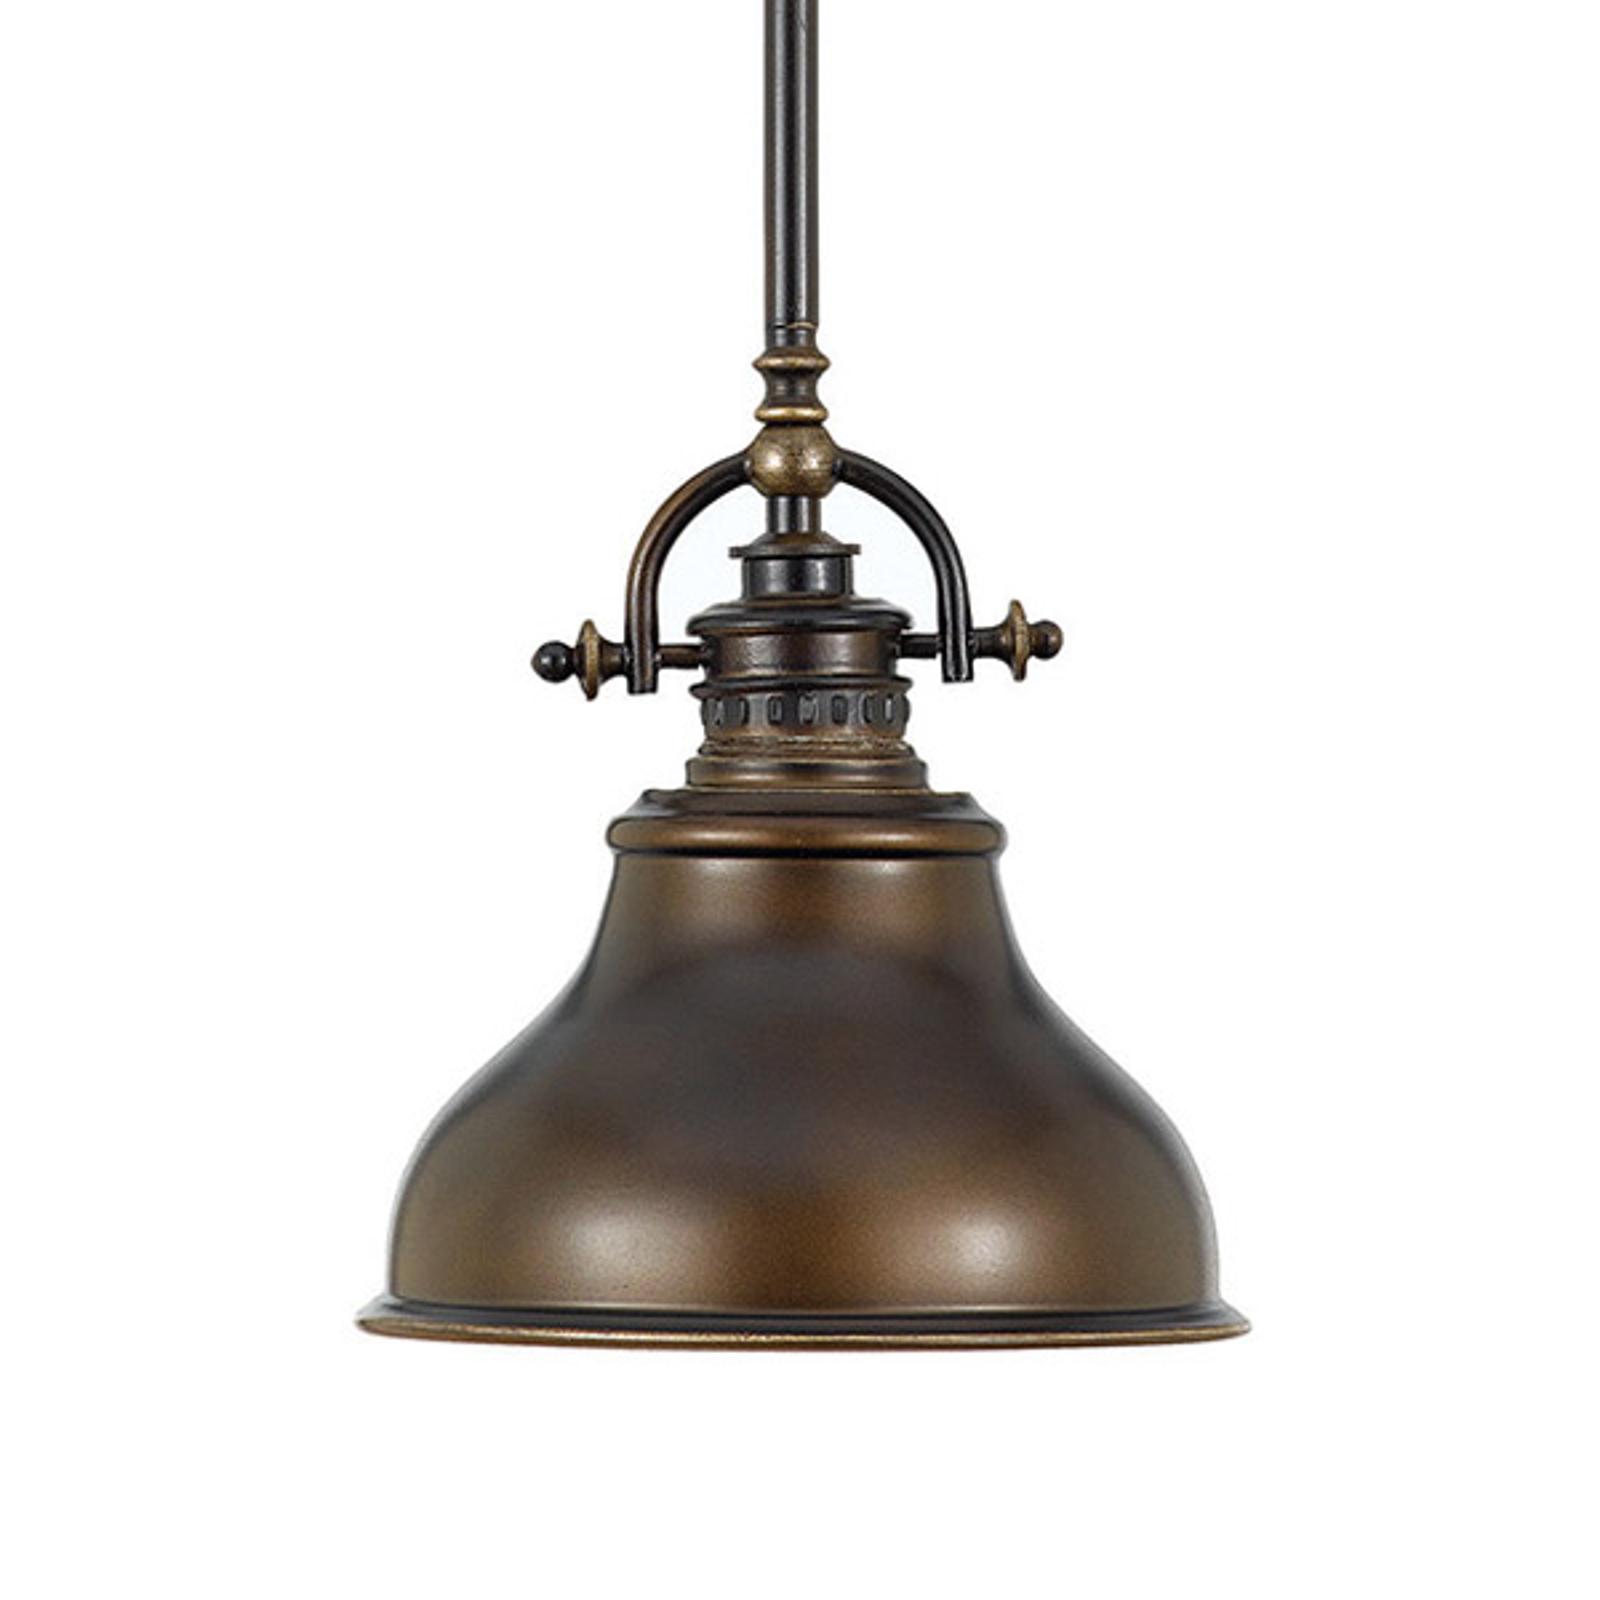 Emery industrial hanging lamp bronze 20.3 cm_3048325_1